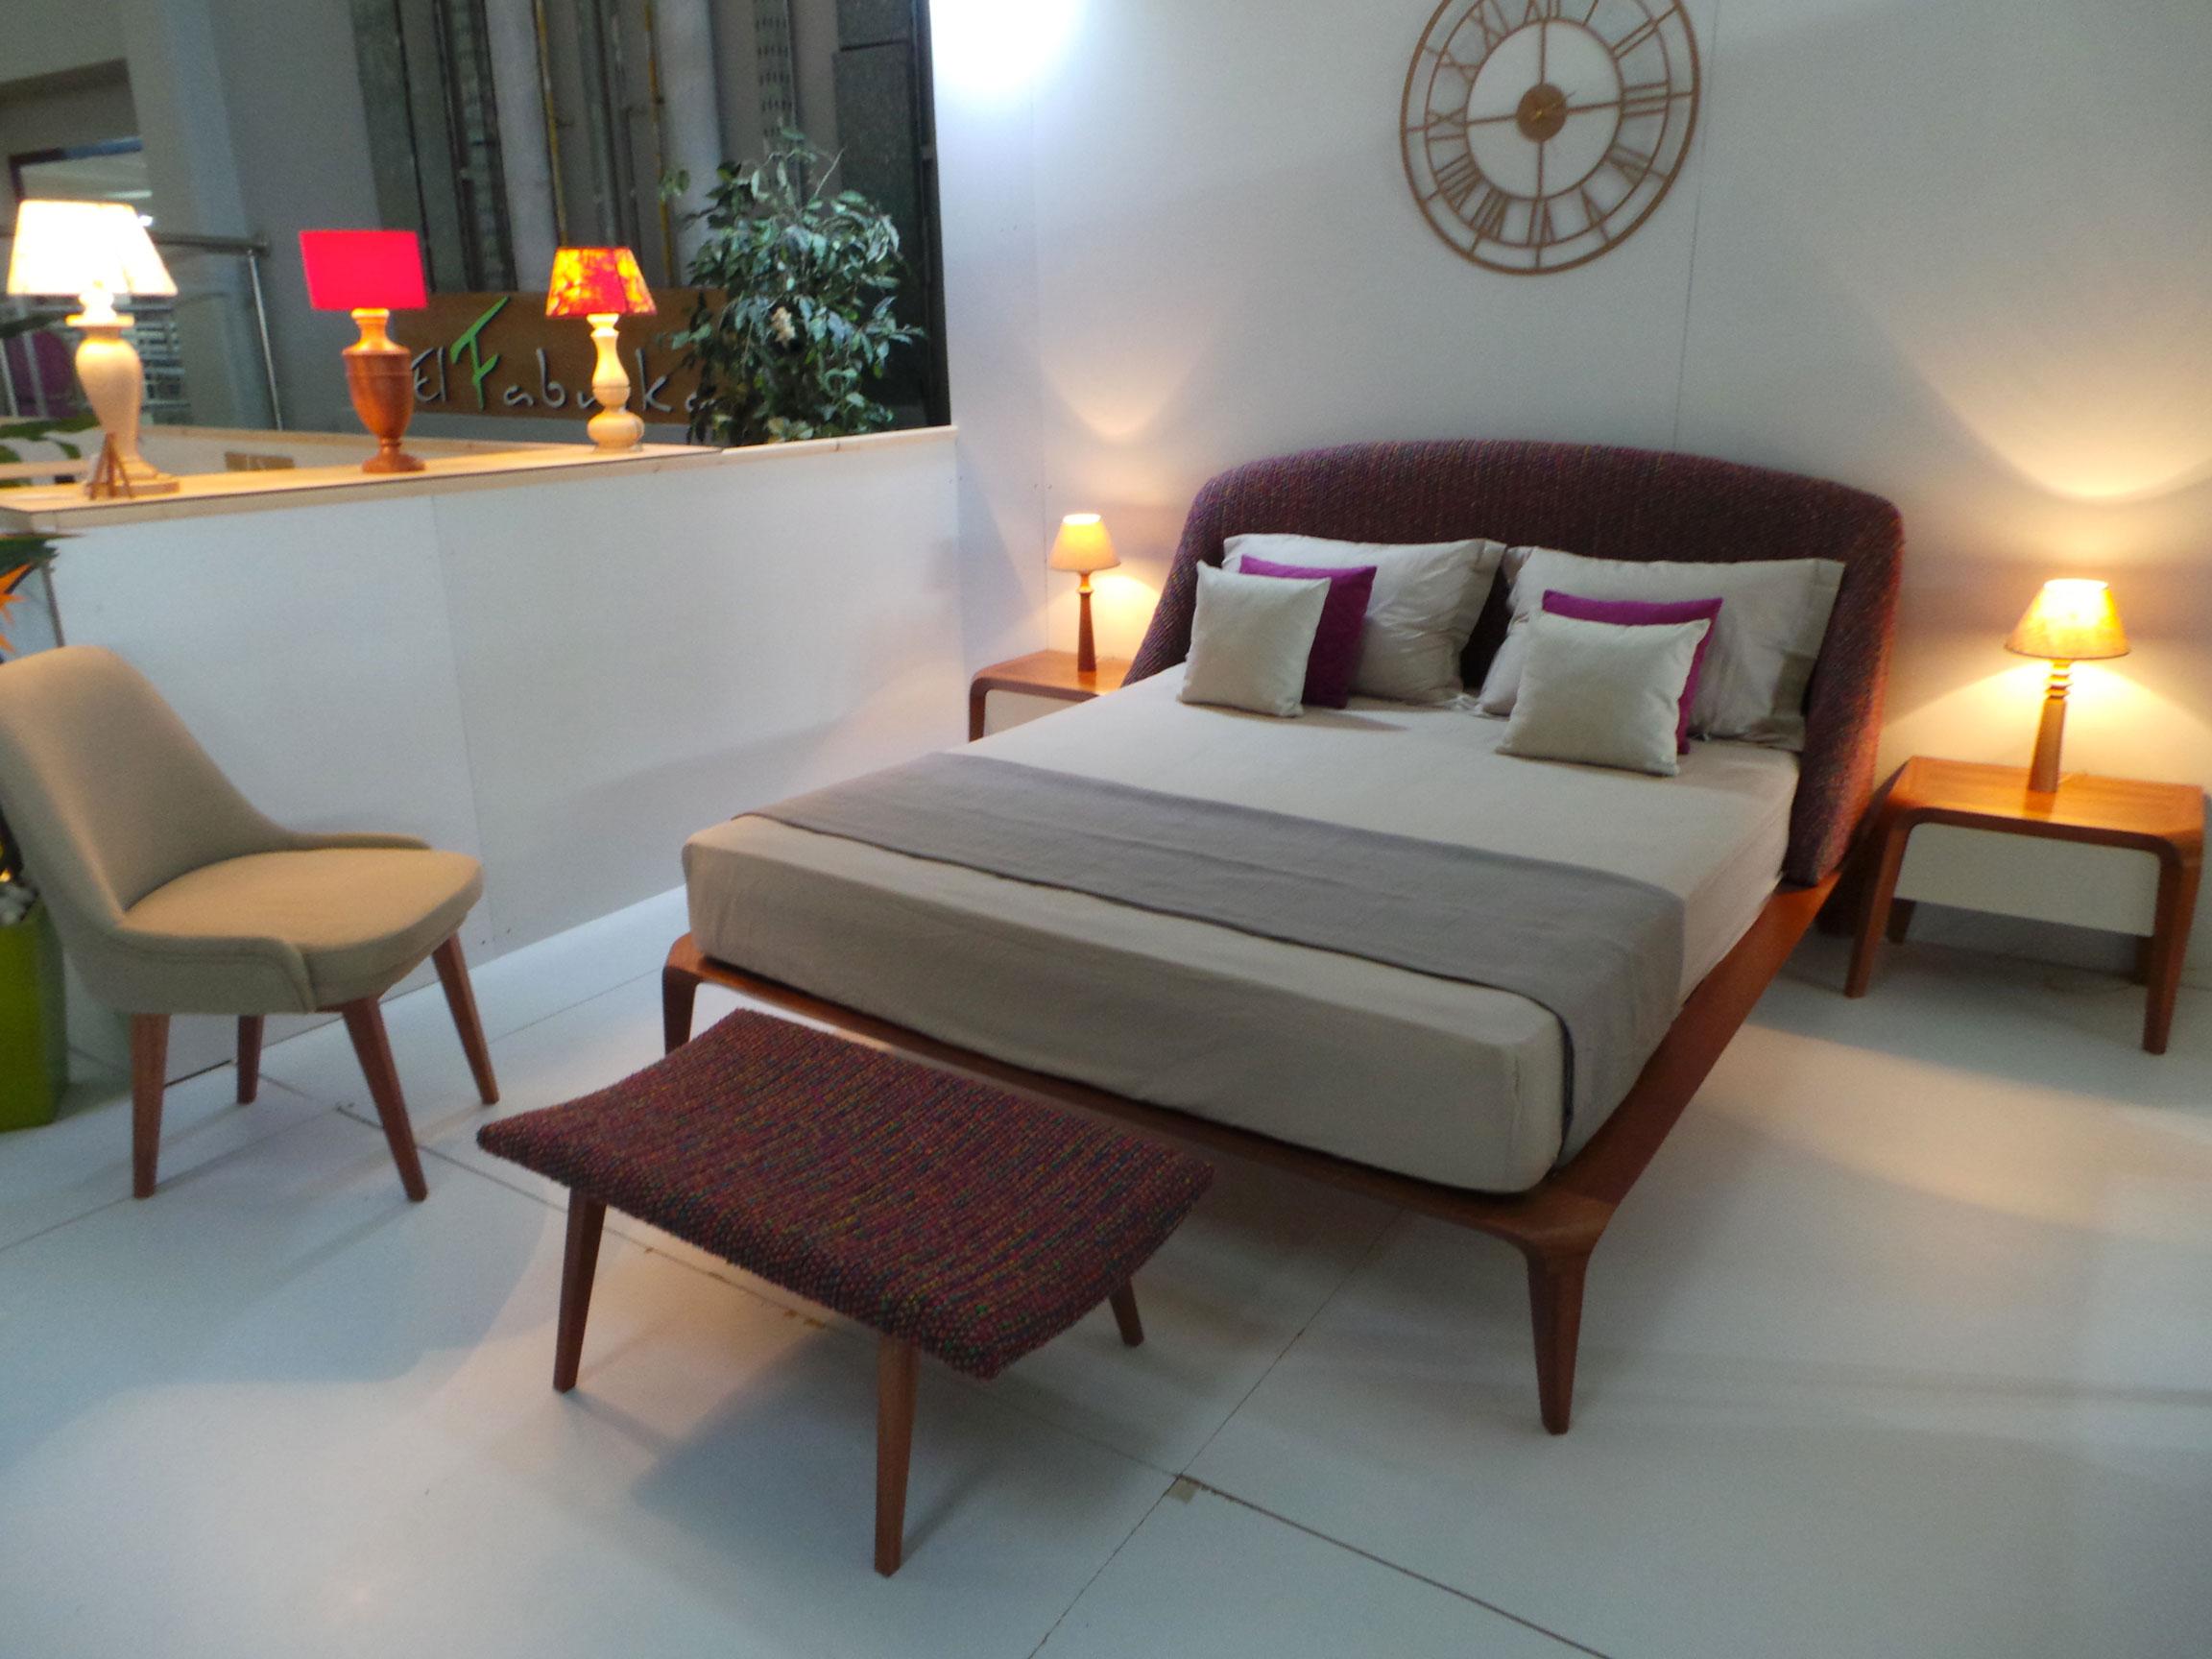 Salo-du-meuble-de-Tunis-chambre-a-coucher-el-fabrika